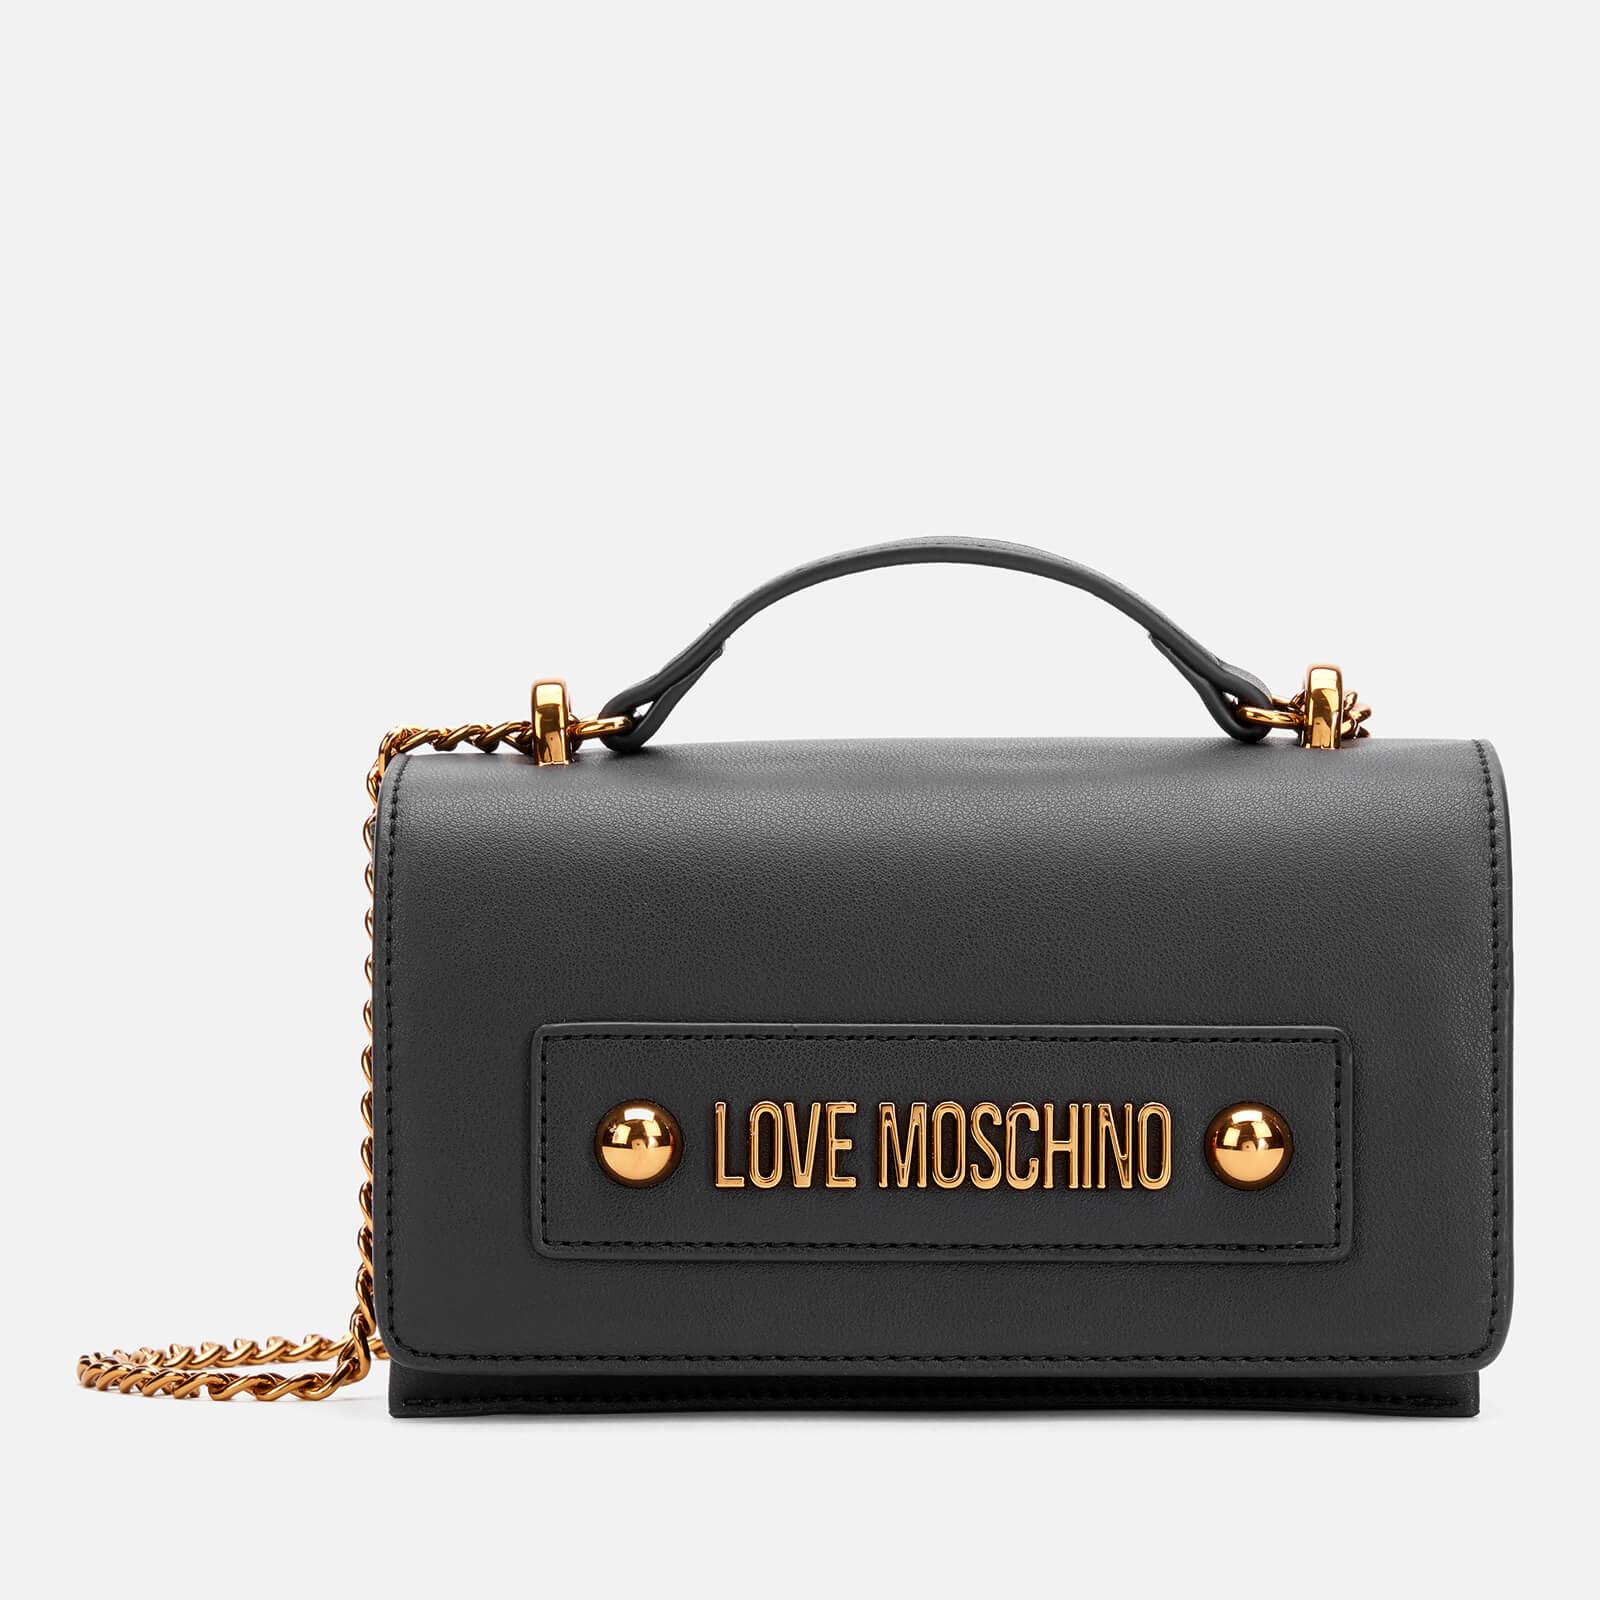 Moschino Love Moschino Women's Logo Shoulder Bag - Black